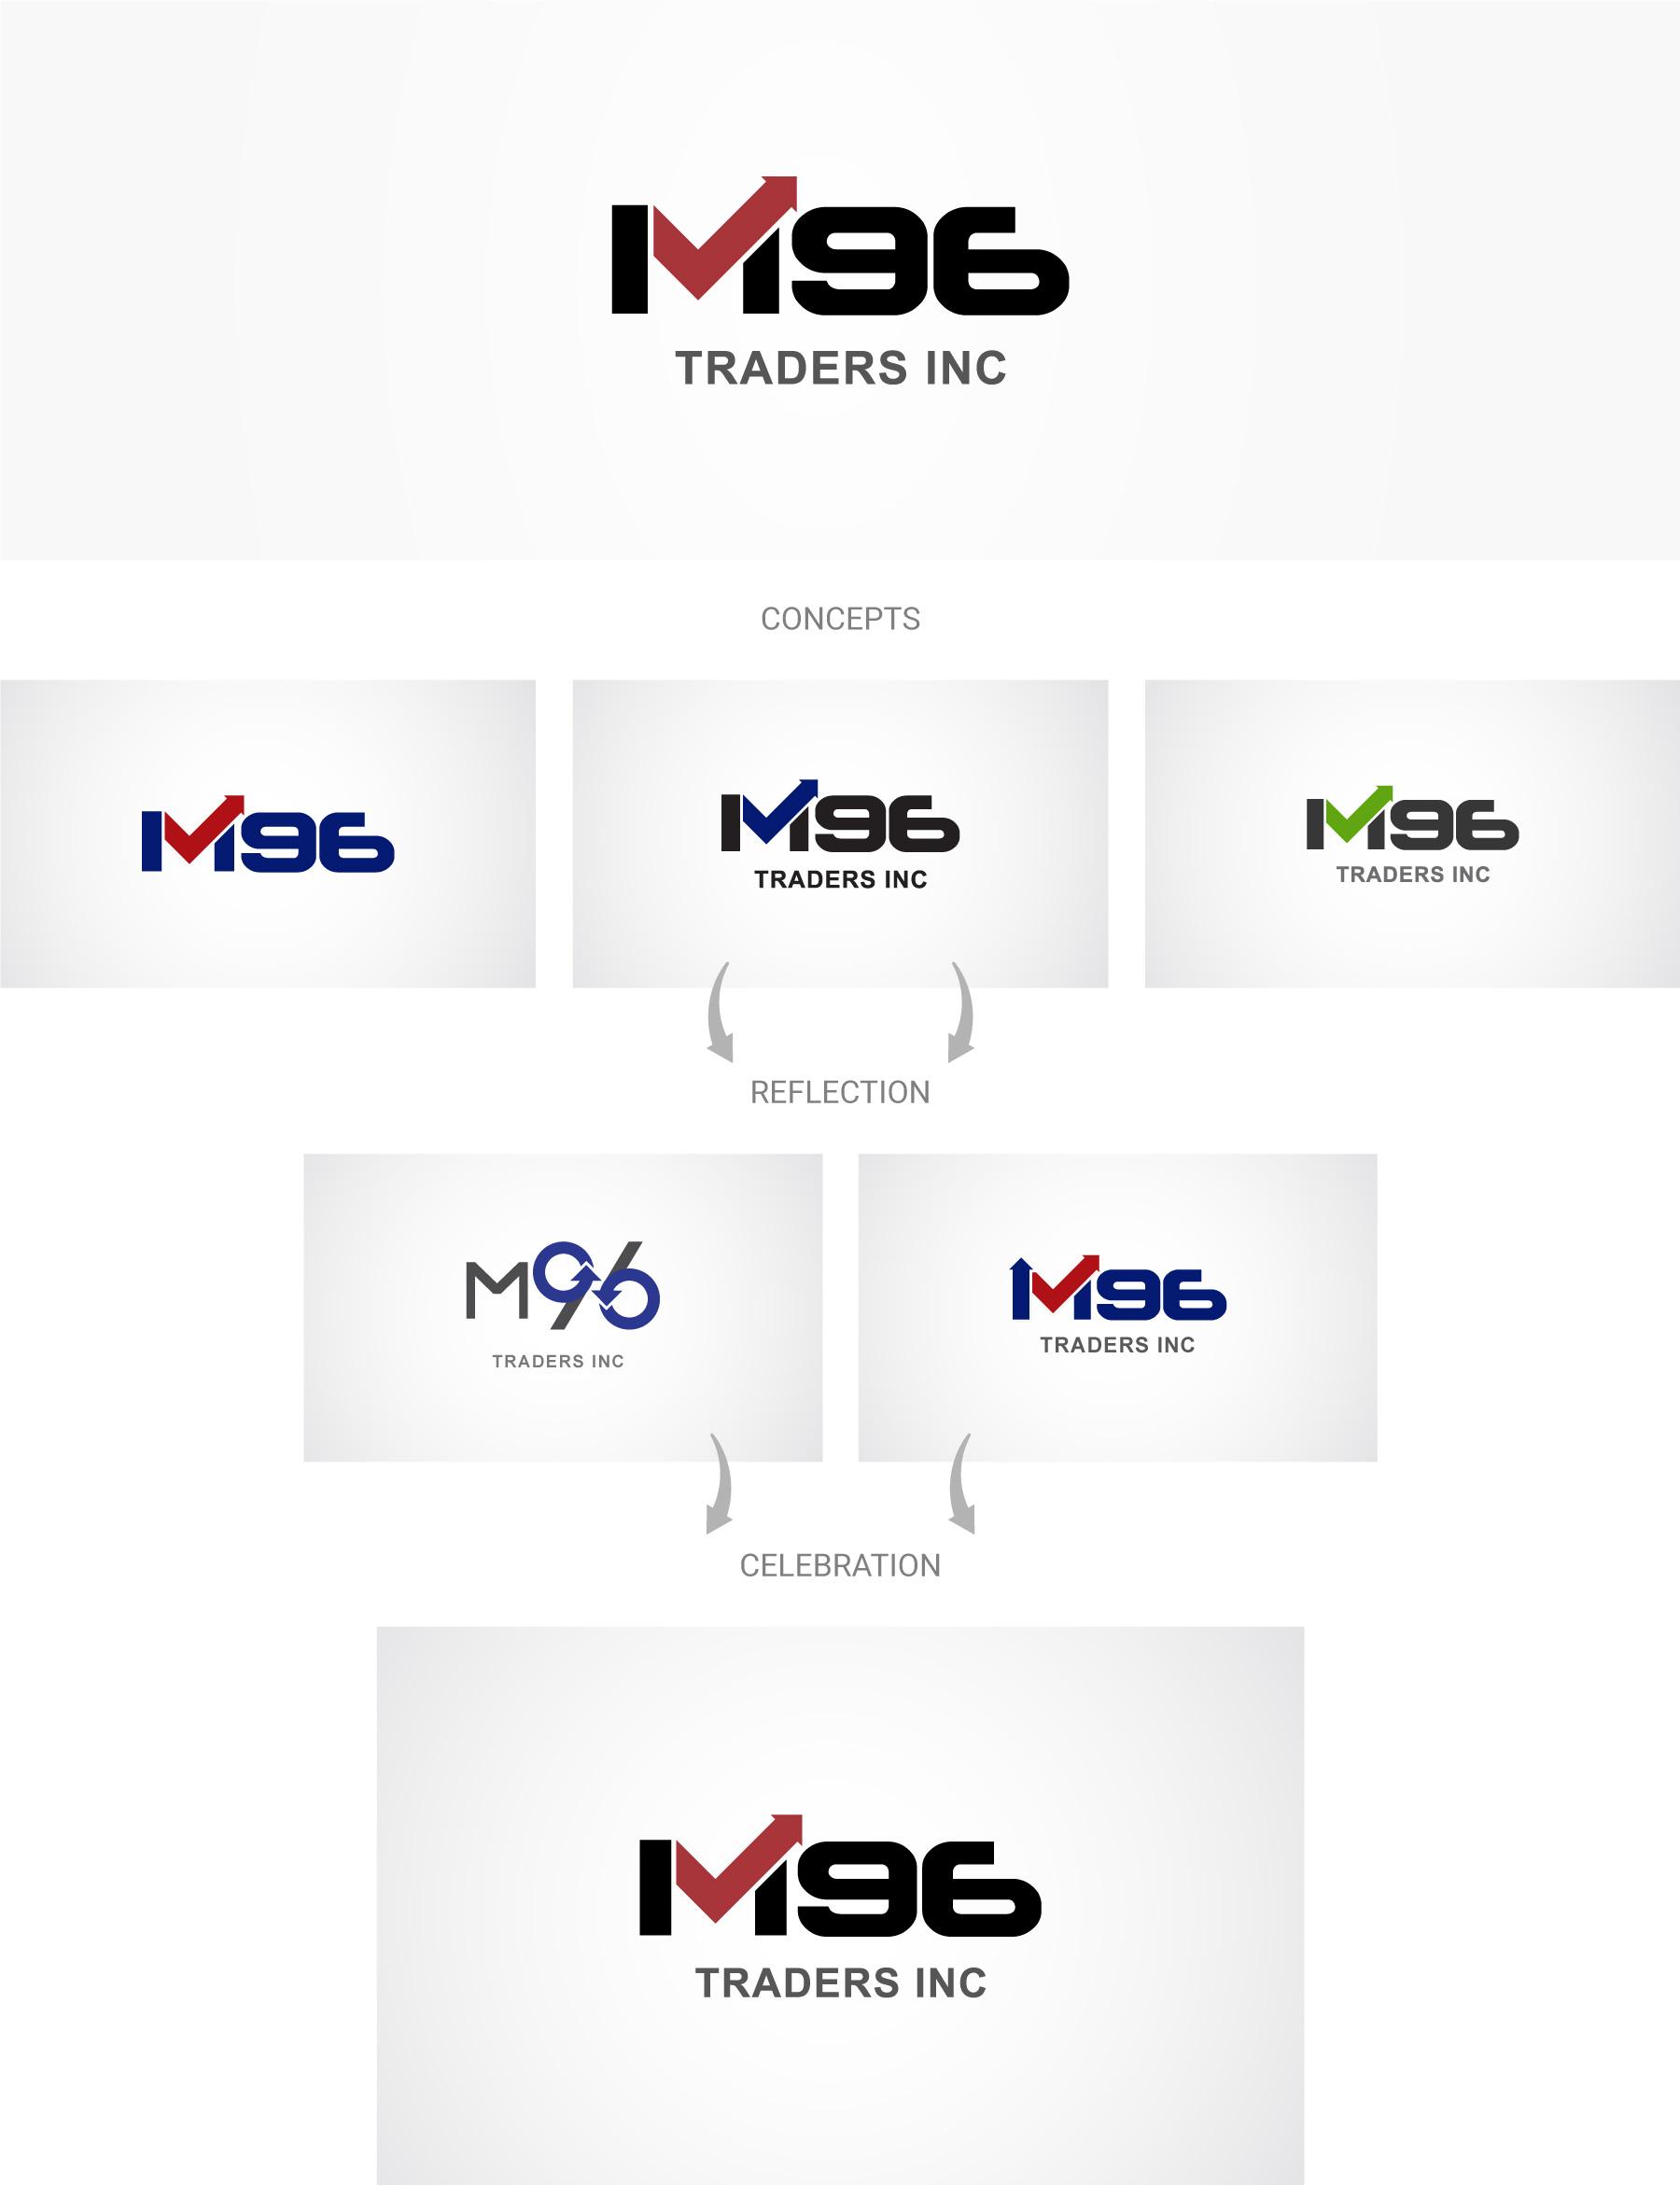 M-trades-inc-logo-design